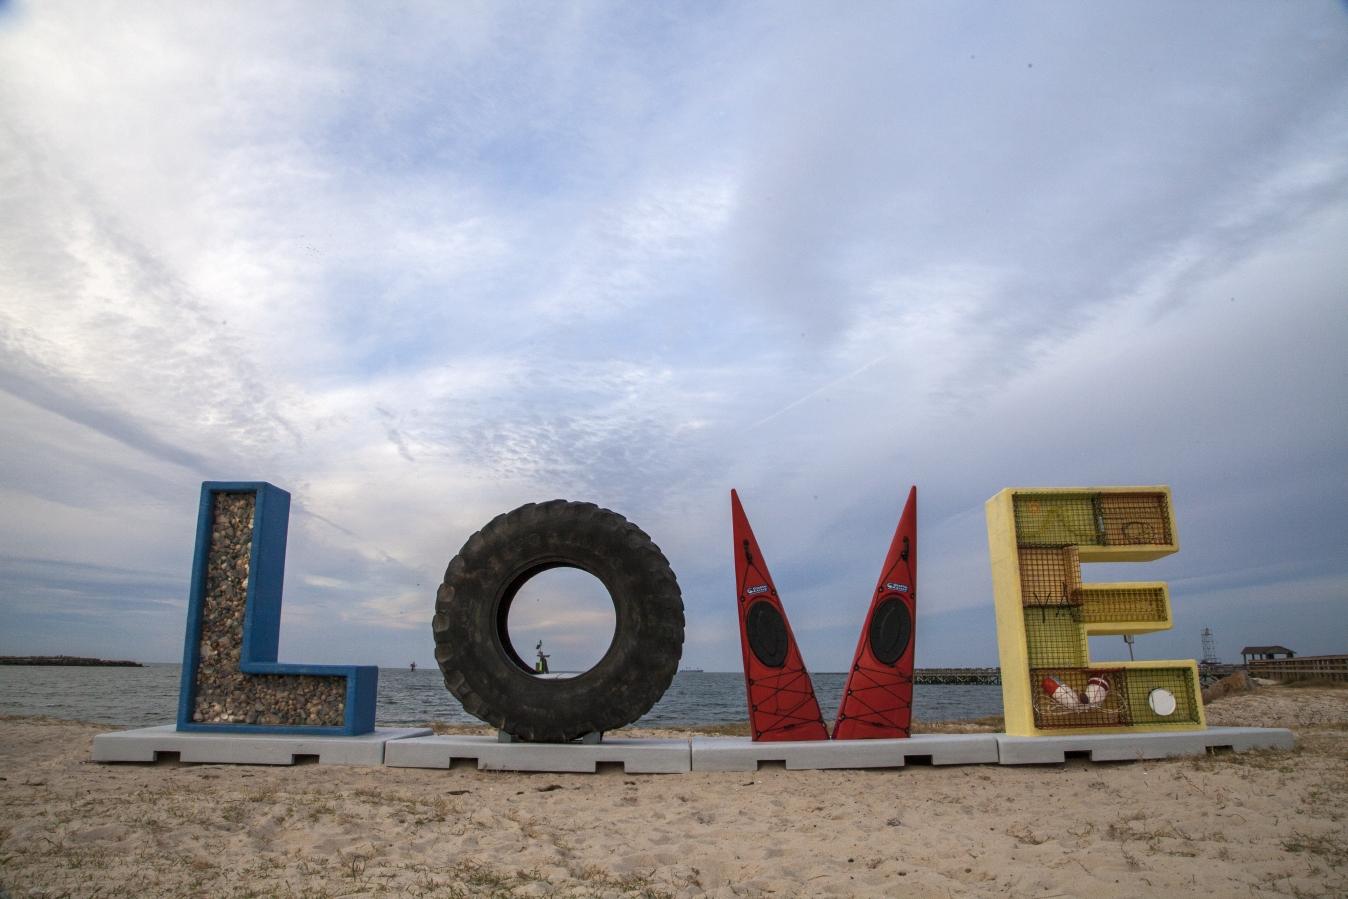 Cape Charles LOVEwork